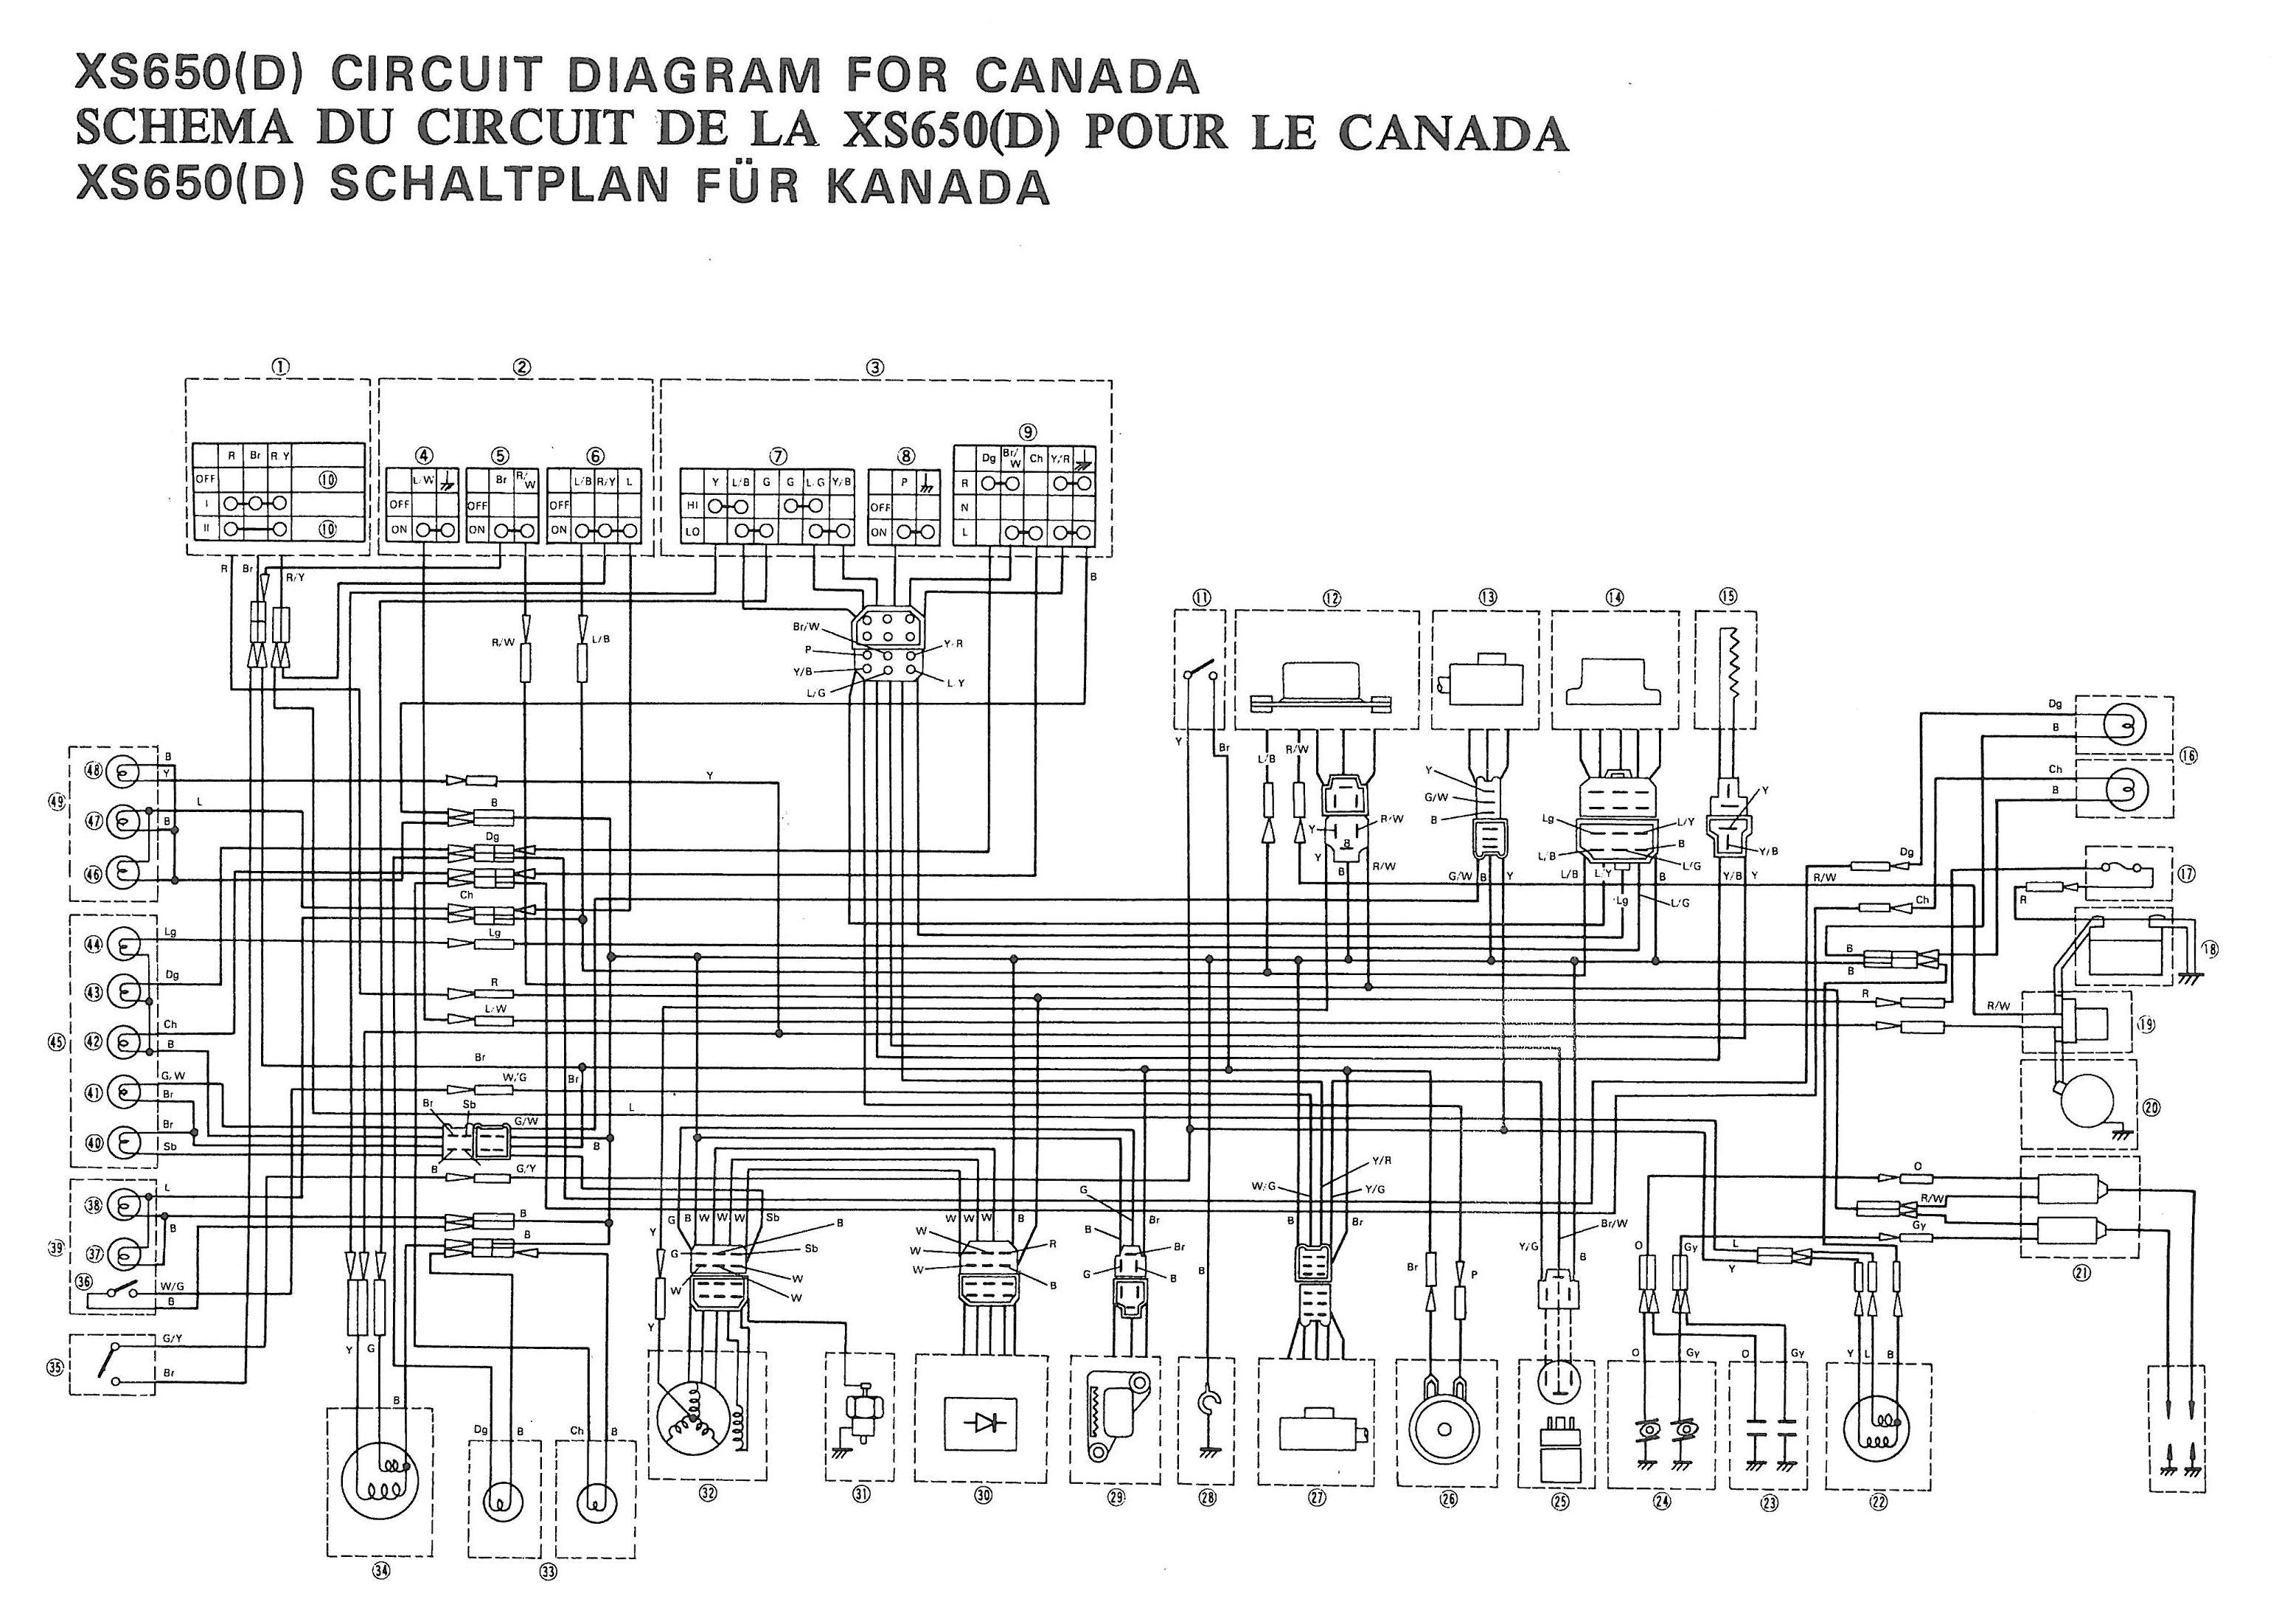 1979 yamaha xs750 special wiring diagram hobbiesxstyle electrical wire diagram on a 1978 xs750 electrical wire [ 3114 x 2187 Pixel ]